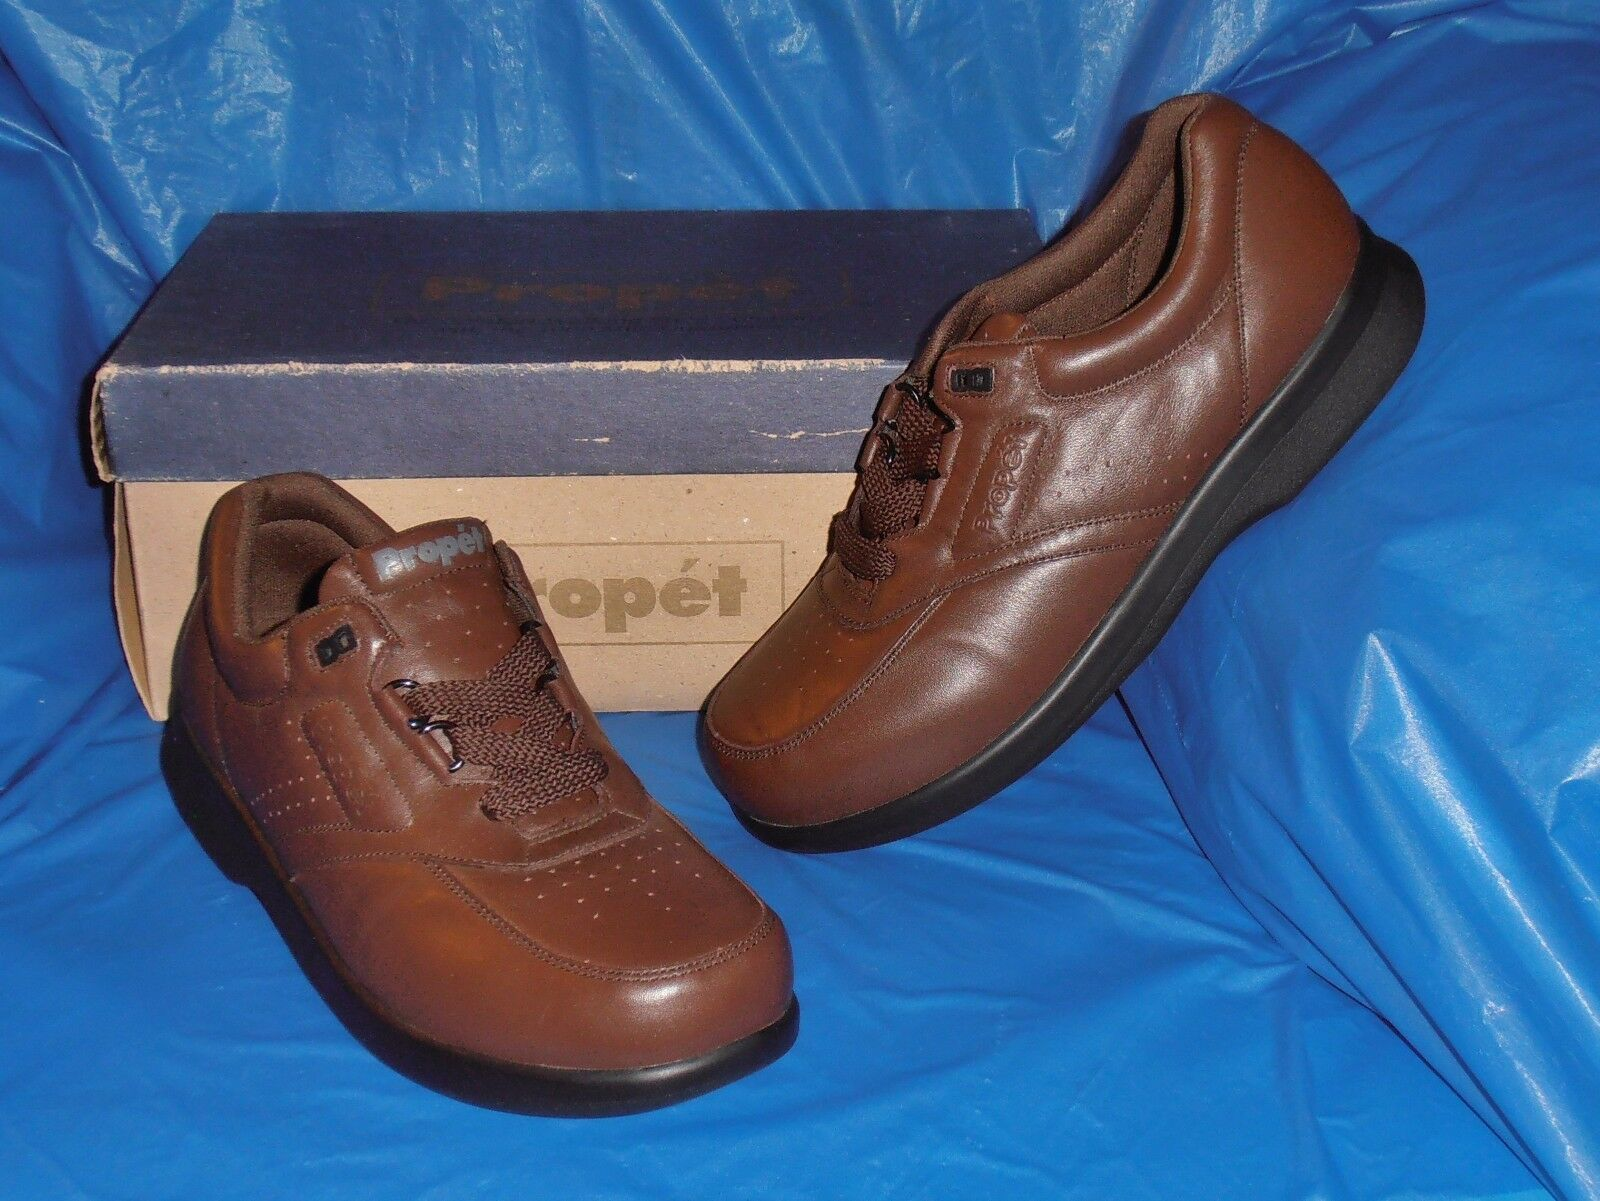 Propet  M3910, Uomo Brown Lite Comfort Walking Shoe. 10  EEE